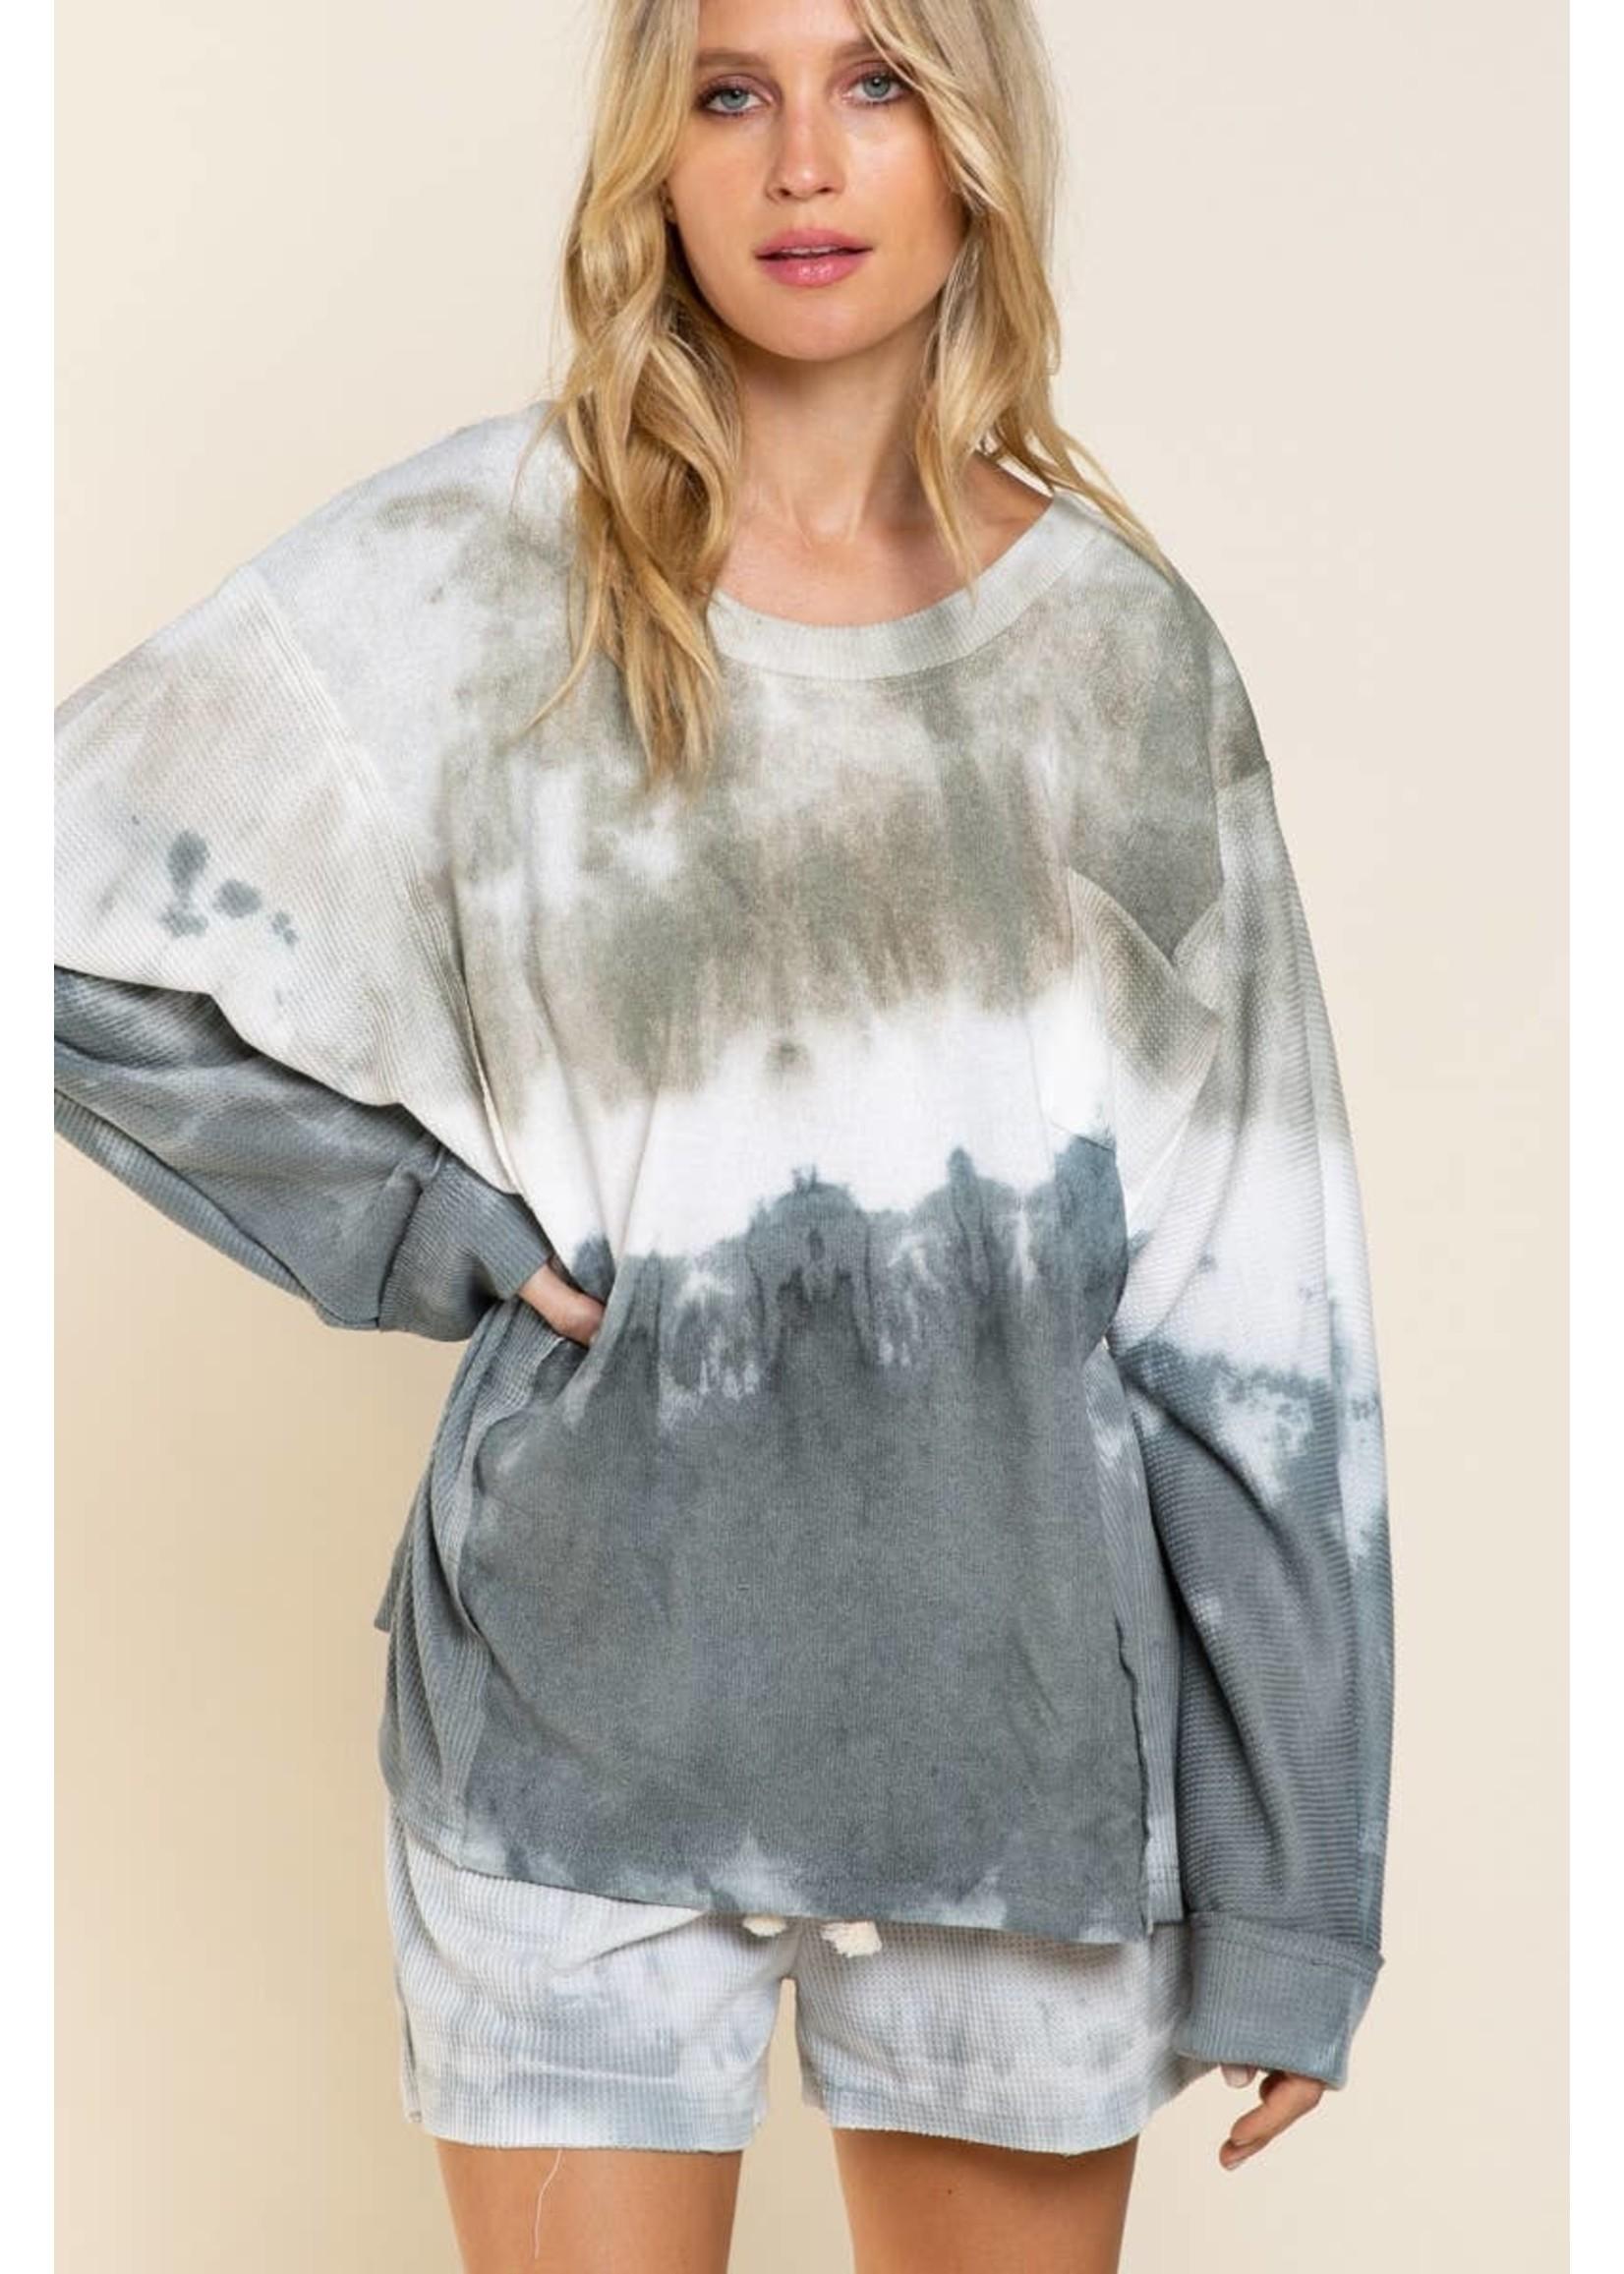 POL Oversized Summer Sweater